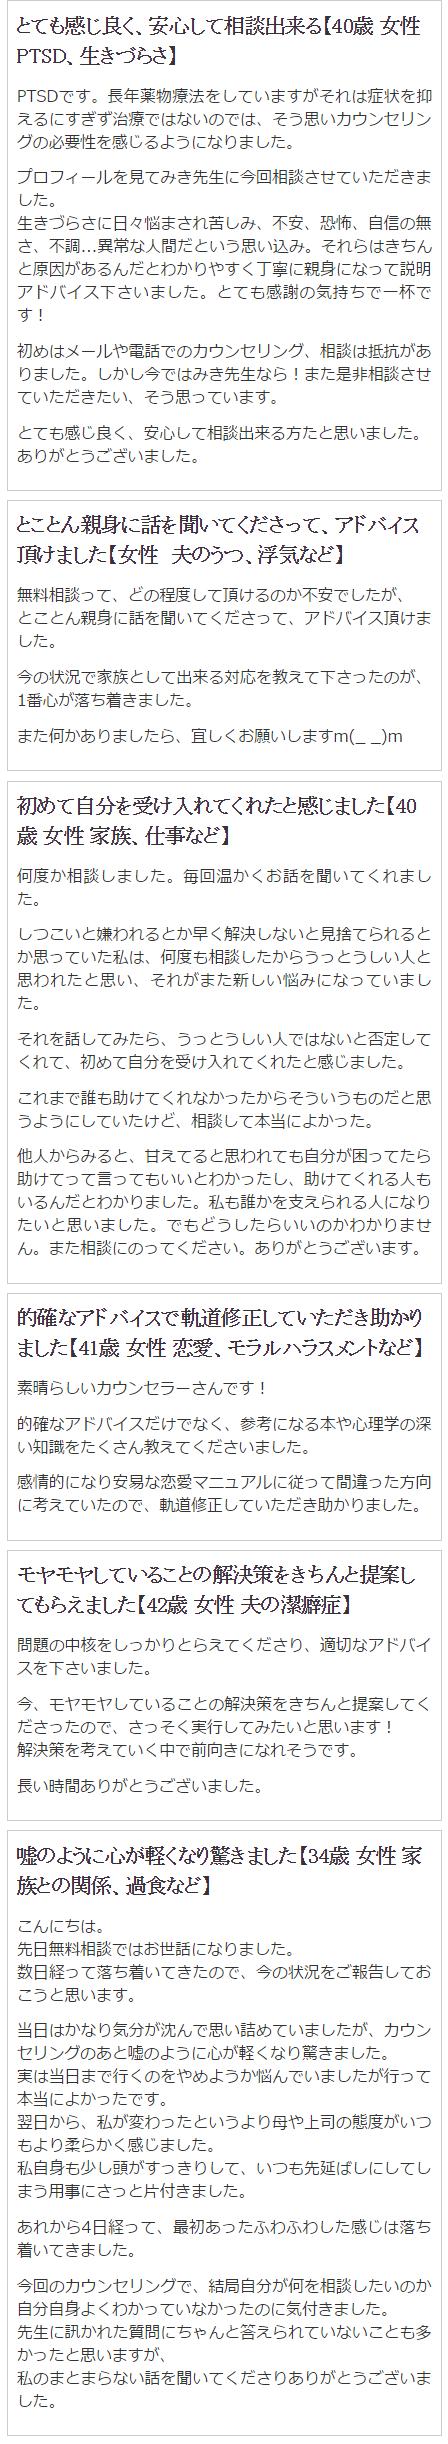 screenshot_244